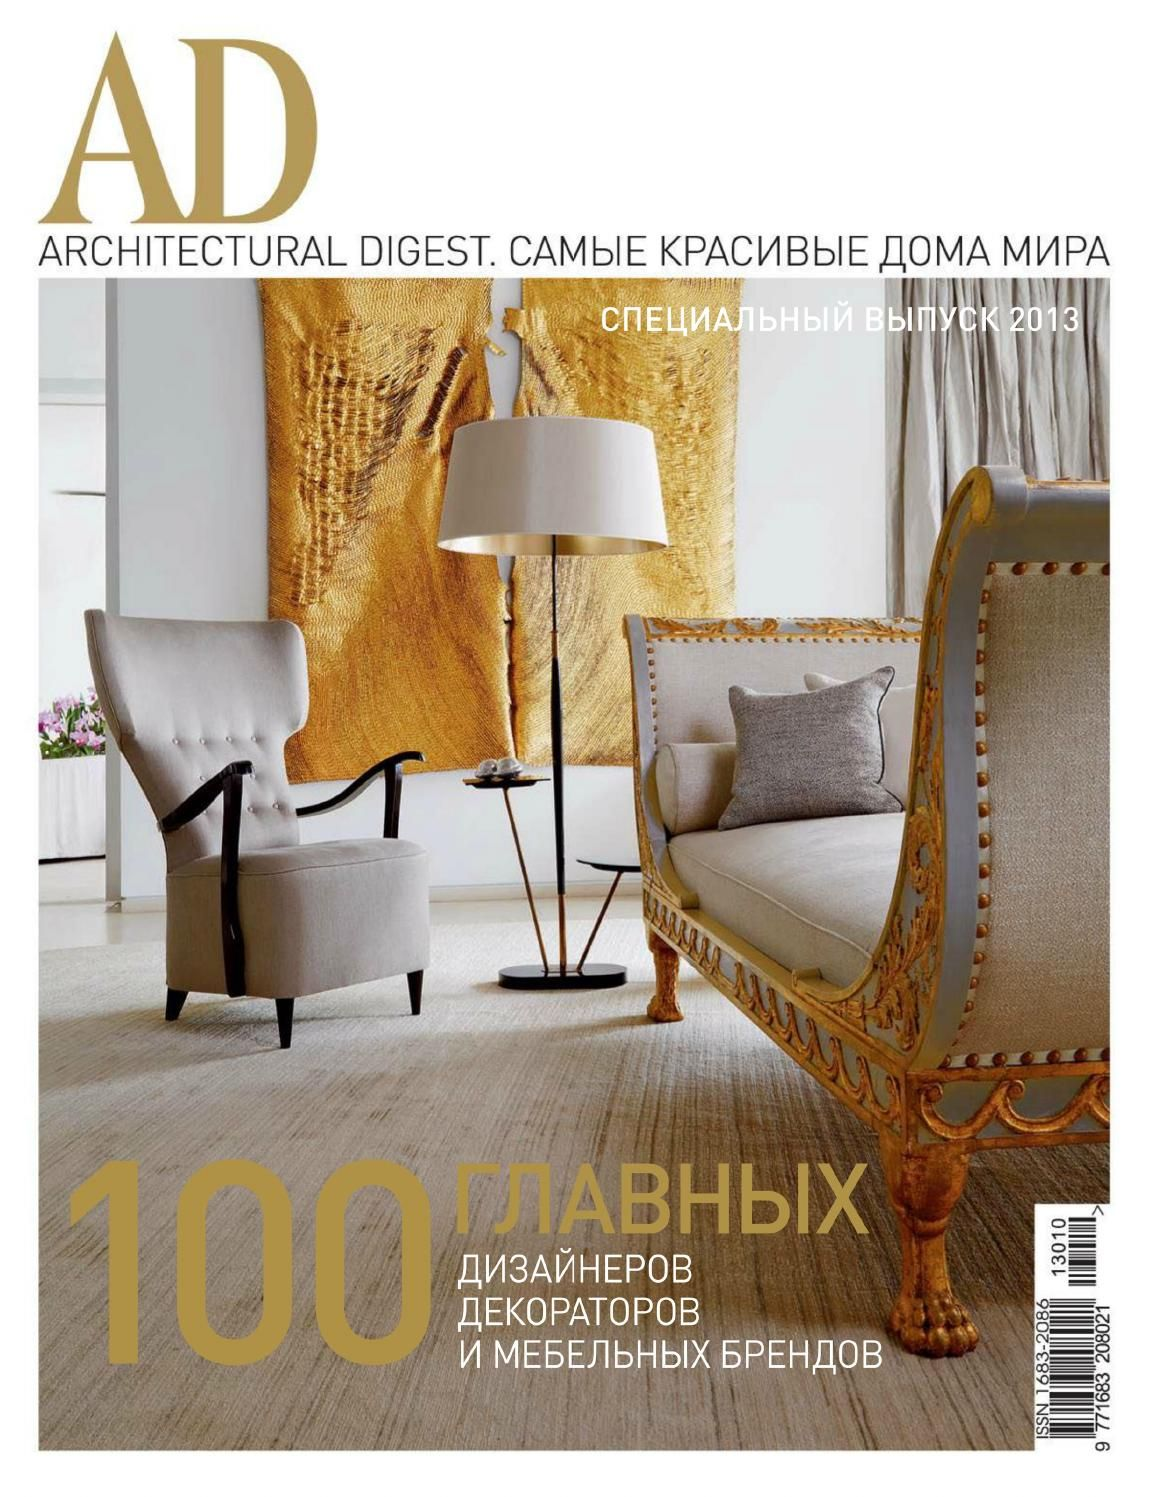 Аd architecturаl digest 2013'10св by moncsi - issuu